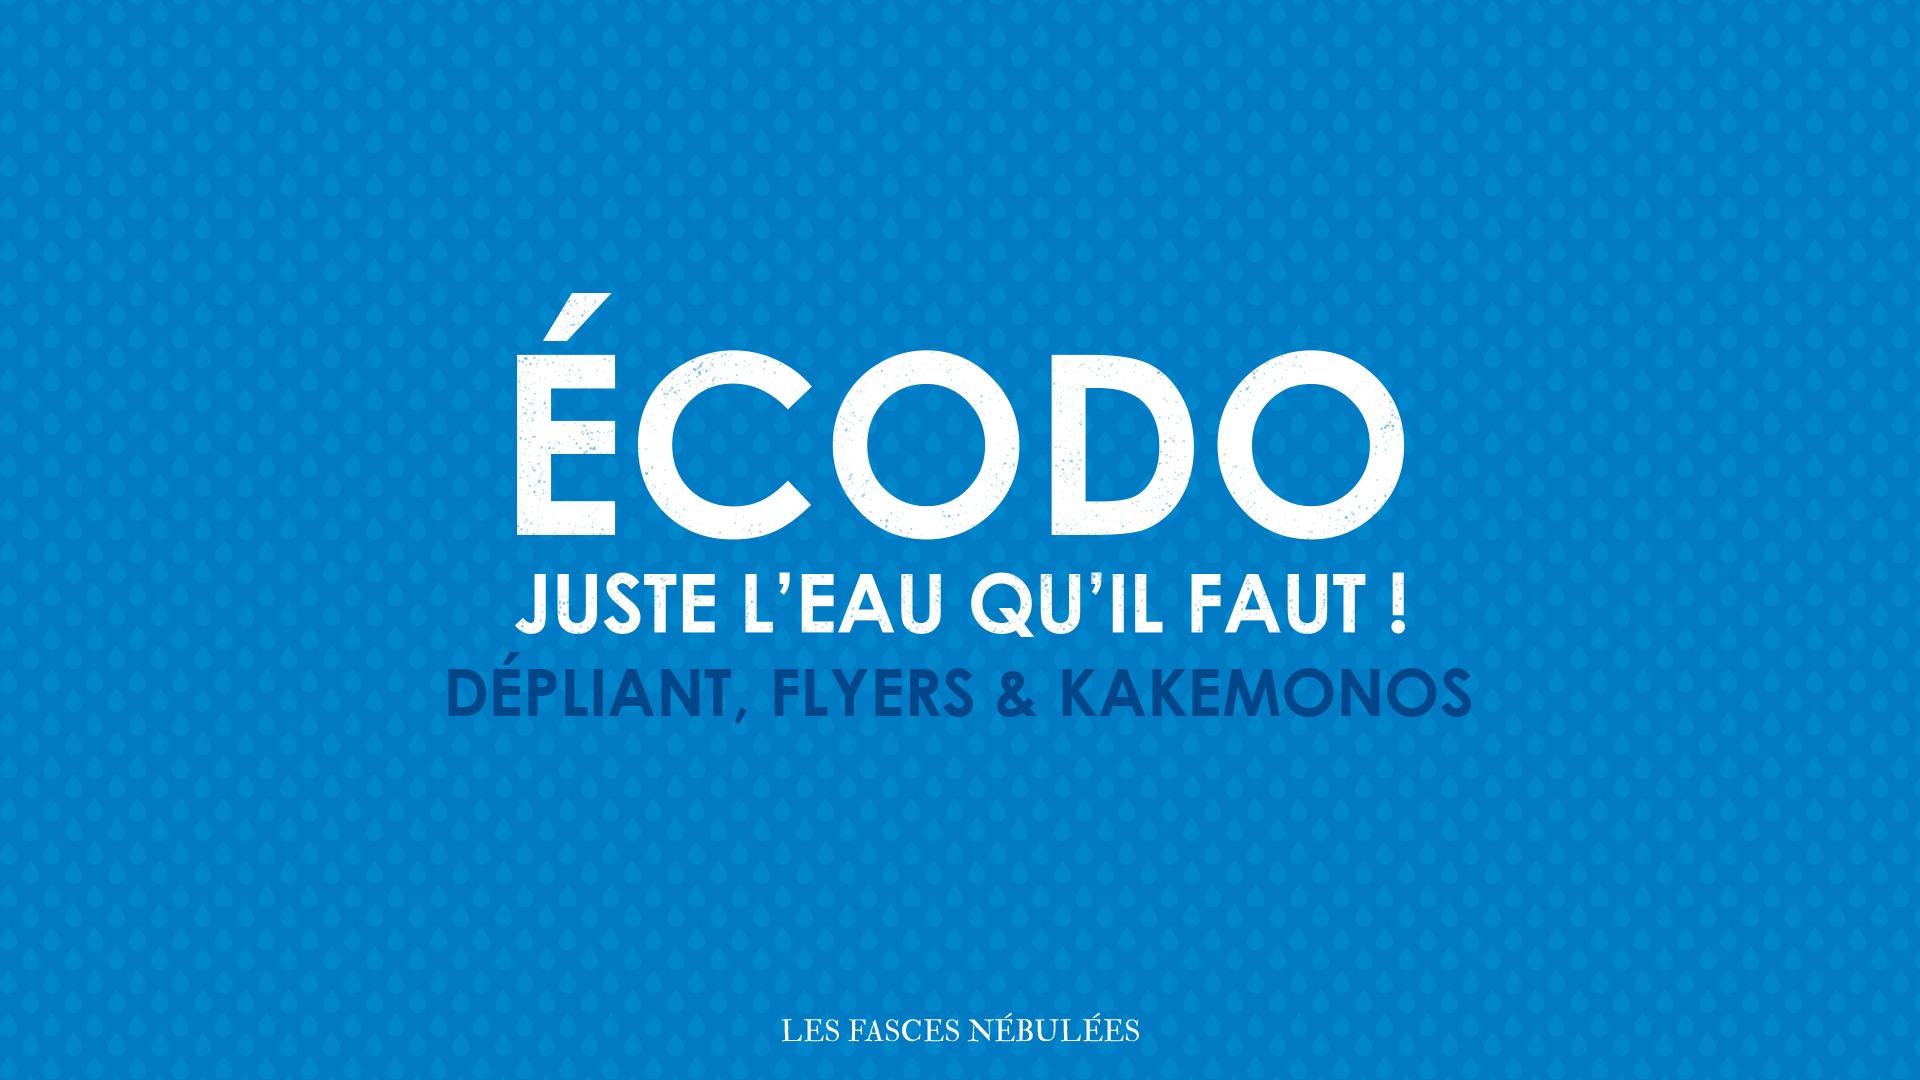 Écodo</br> dépliant, flyers </BR> & kakemonos